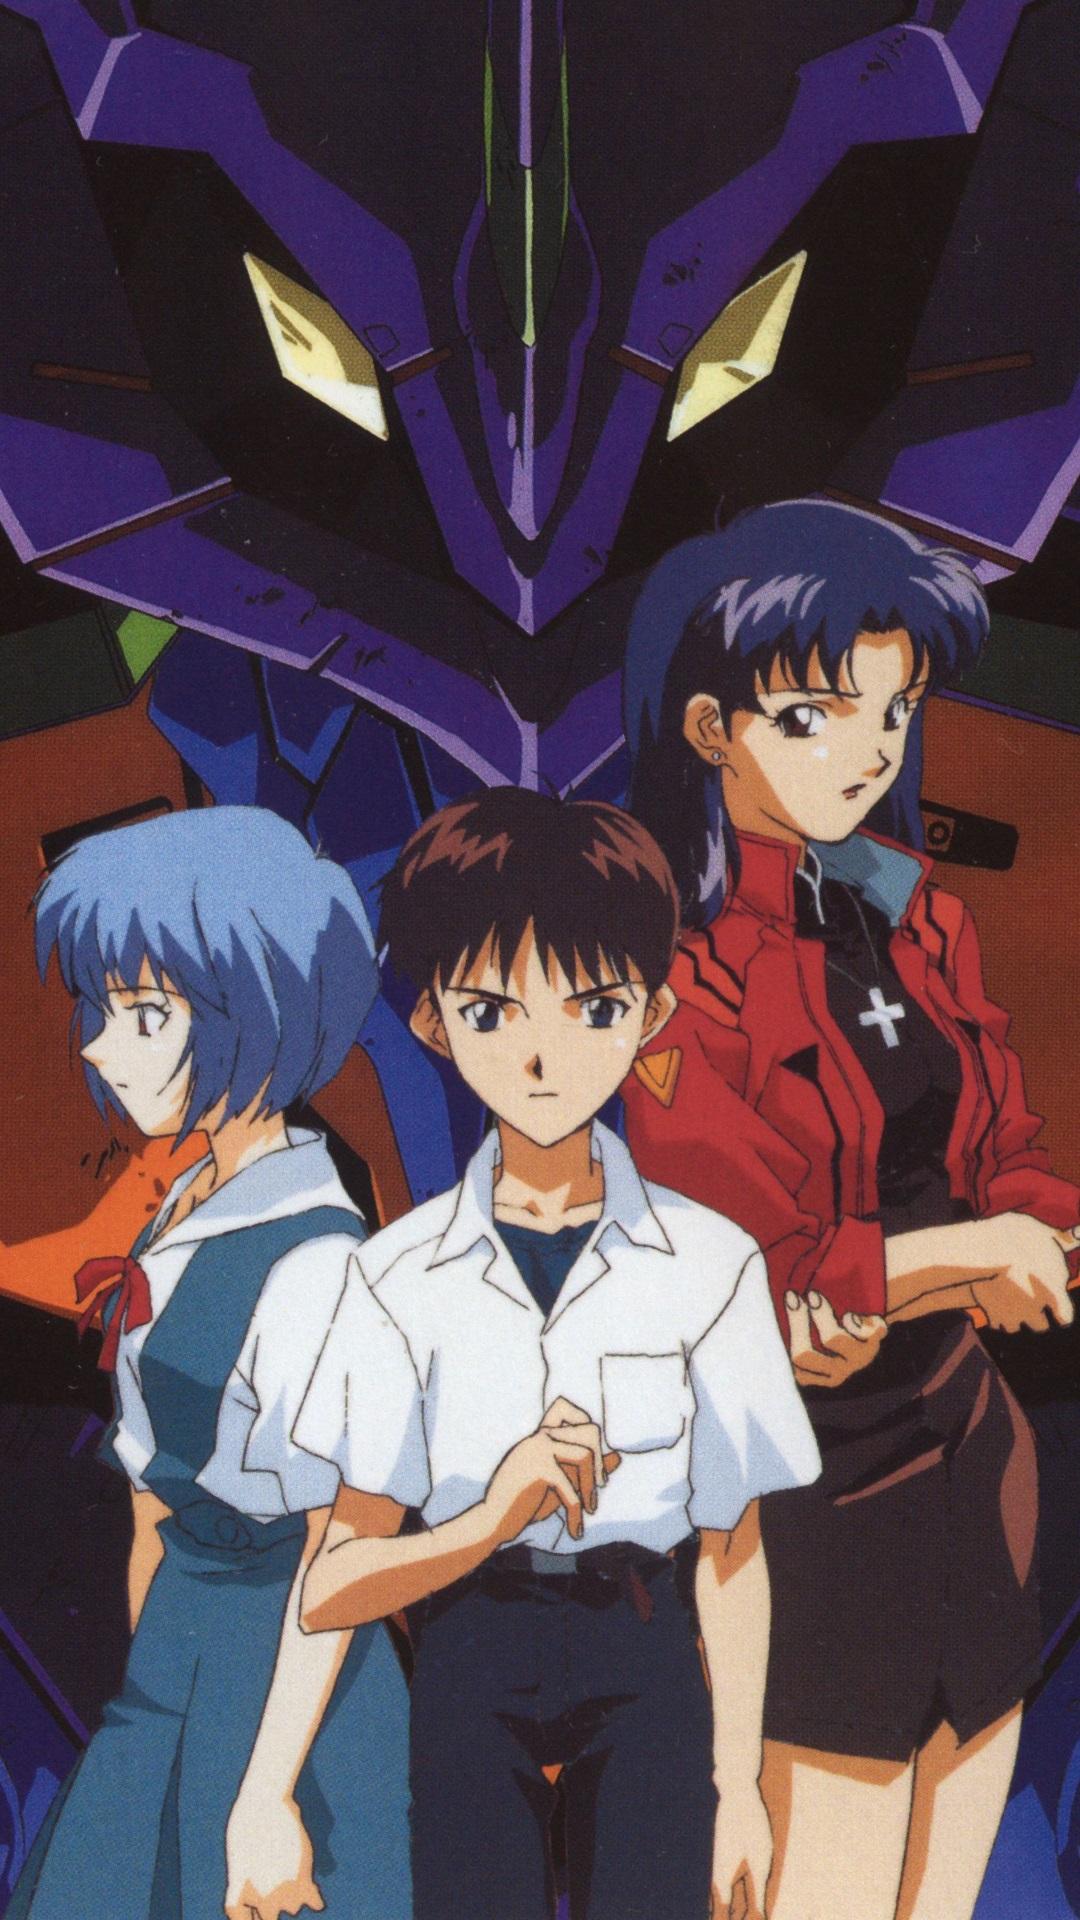 Neon Genesis Evangelion Misato Katsuragi Rei Ayanami Neon Genesis Evangelion Wallpaper Android 1080x1920 Wallpaper Teahub Io